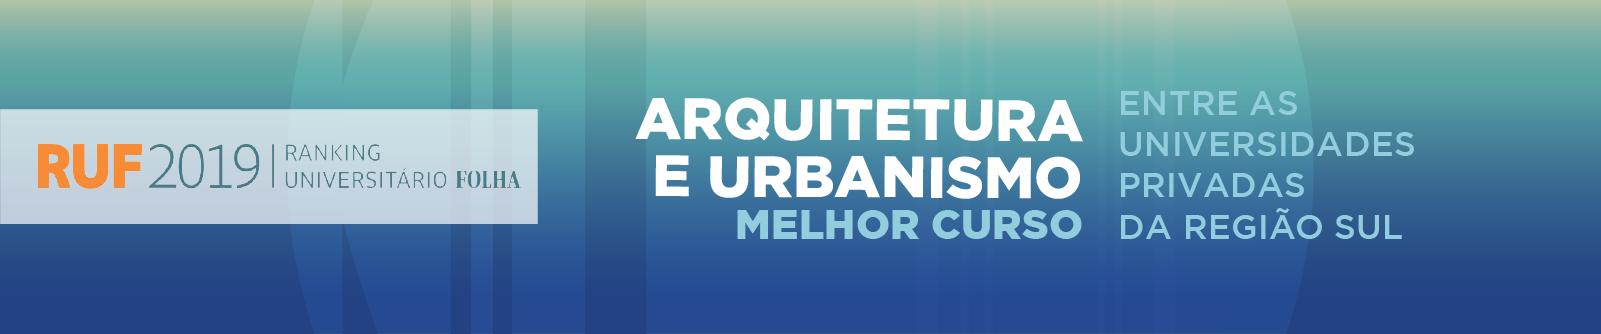 RUF arquitetura e urbanismo